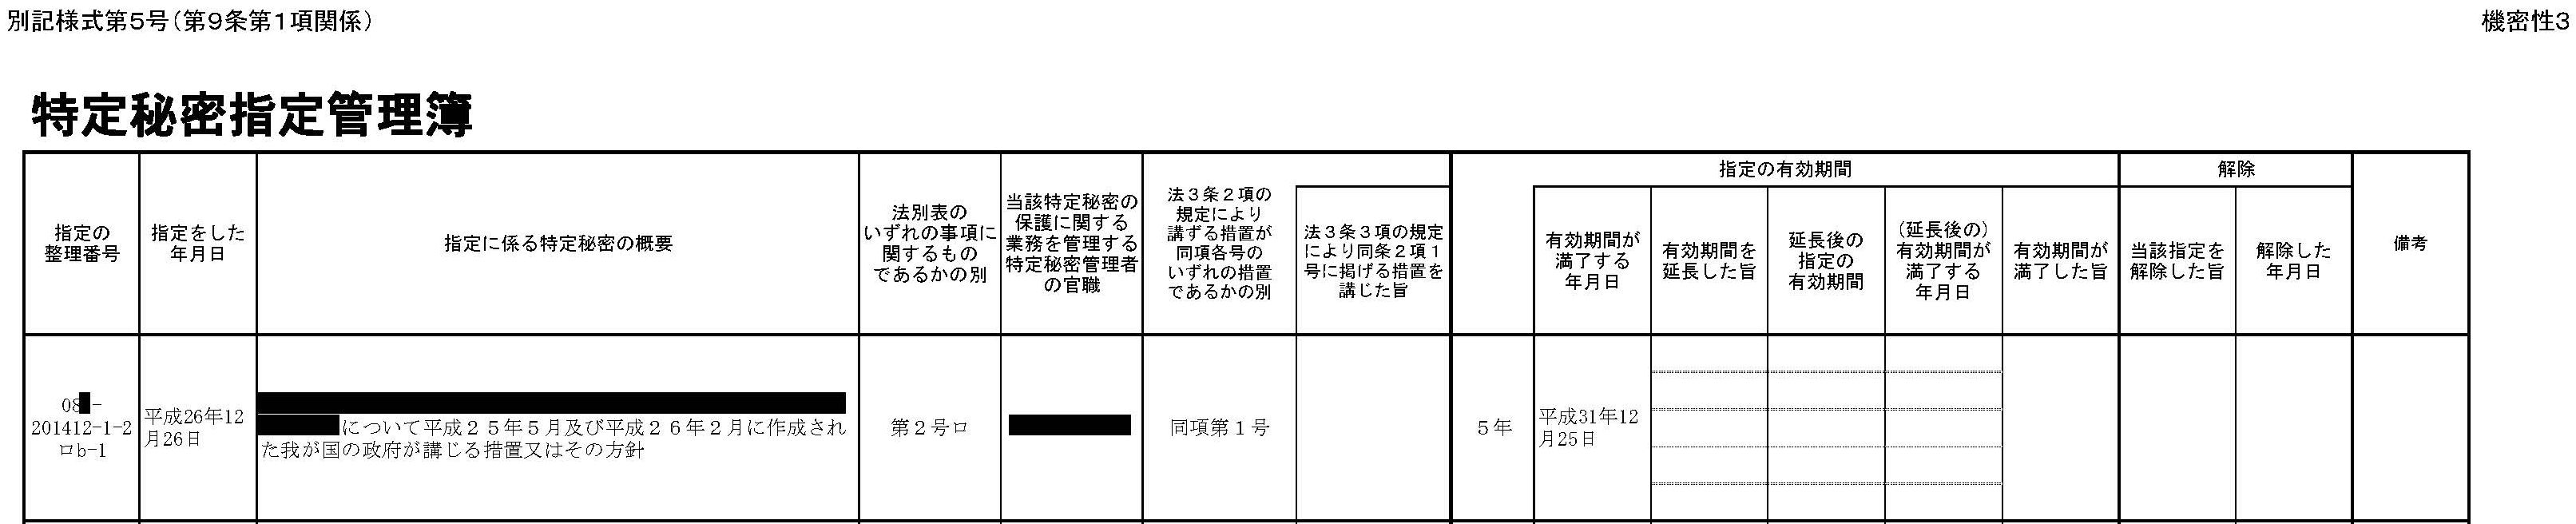 法務省「特定秘密概要不開示」の中身 異議申し立て棄却 _d0011701_10483650.jpg